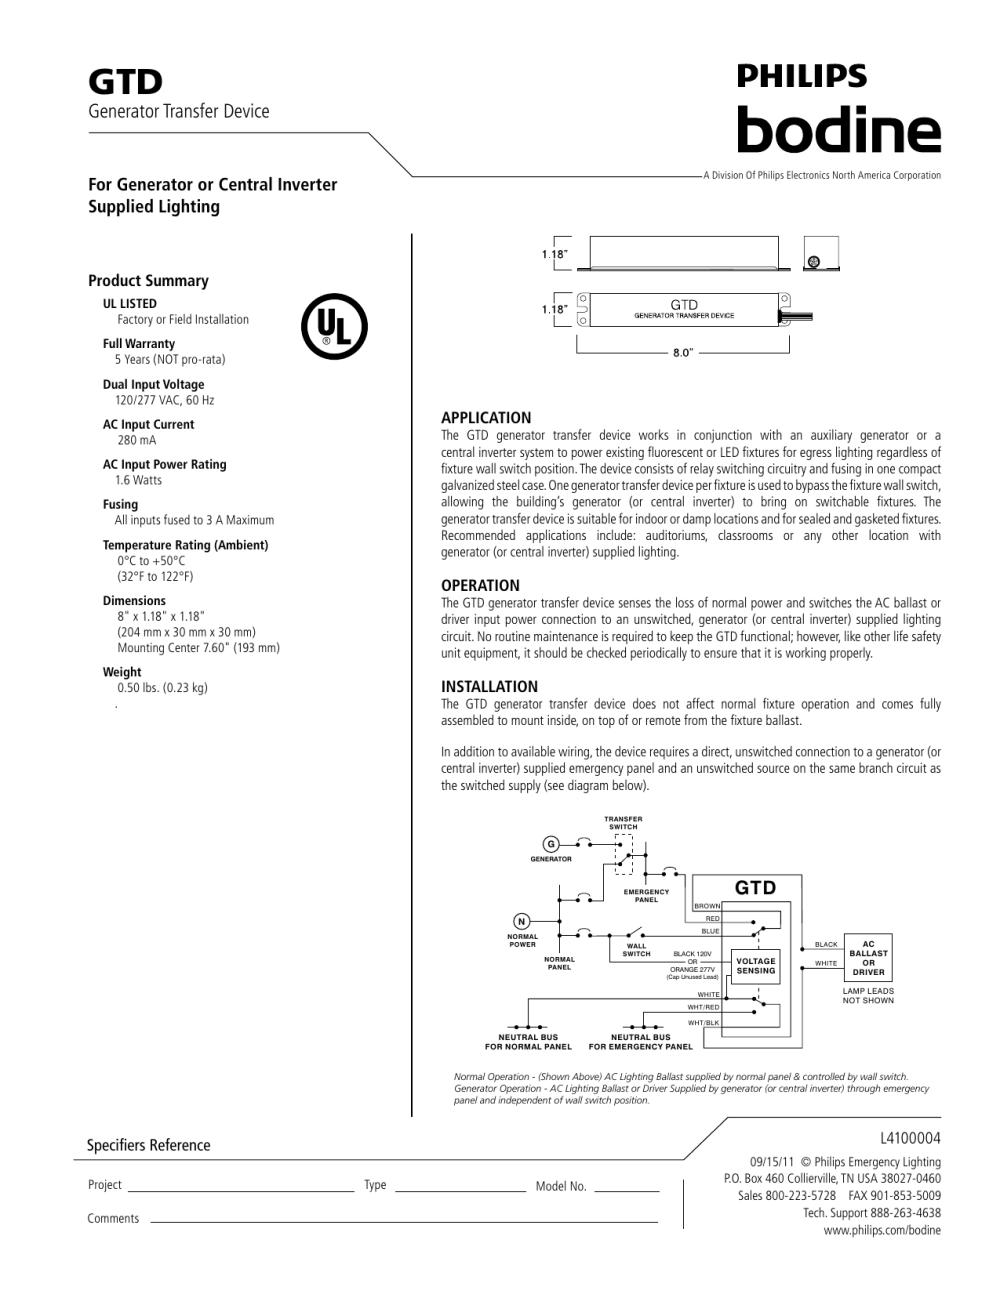 medium resolution of  generator transfer device manualzz com on bodine lighting bodine lighting rep bodine emergency lighting relay on lighting circuit wiring diagram